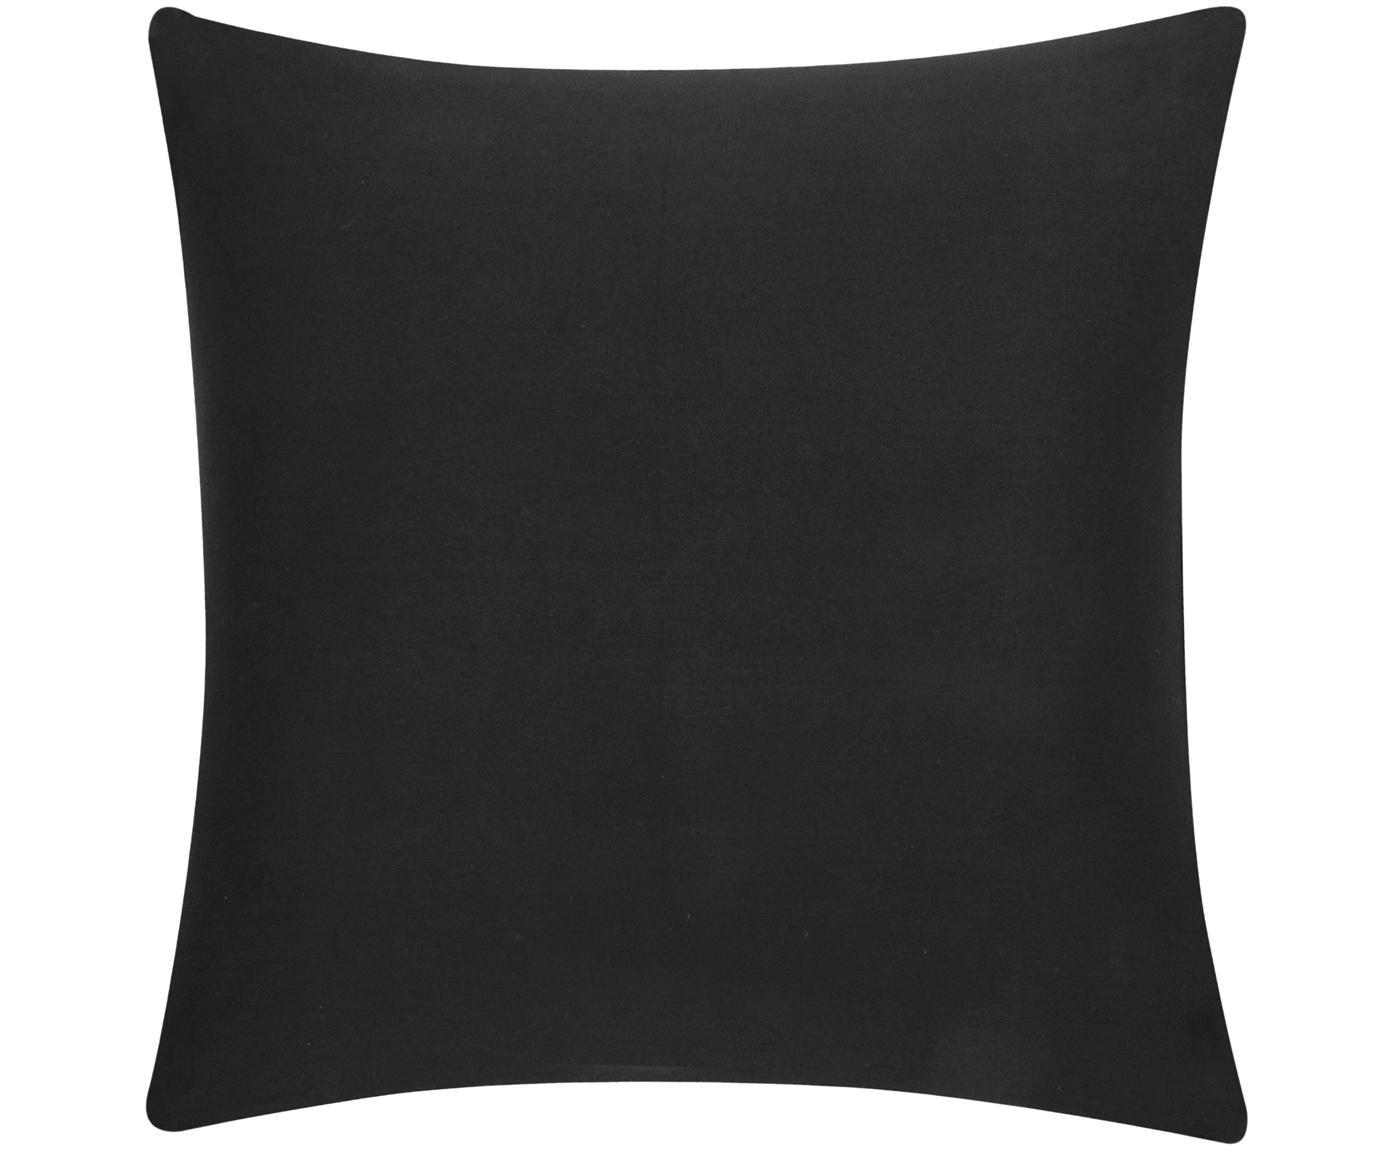 Kussenhoes Mads, 100% katoen, Zwart, 40 x 40 cm